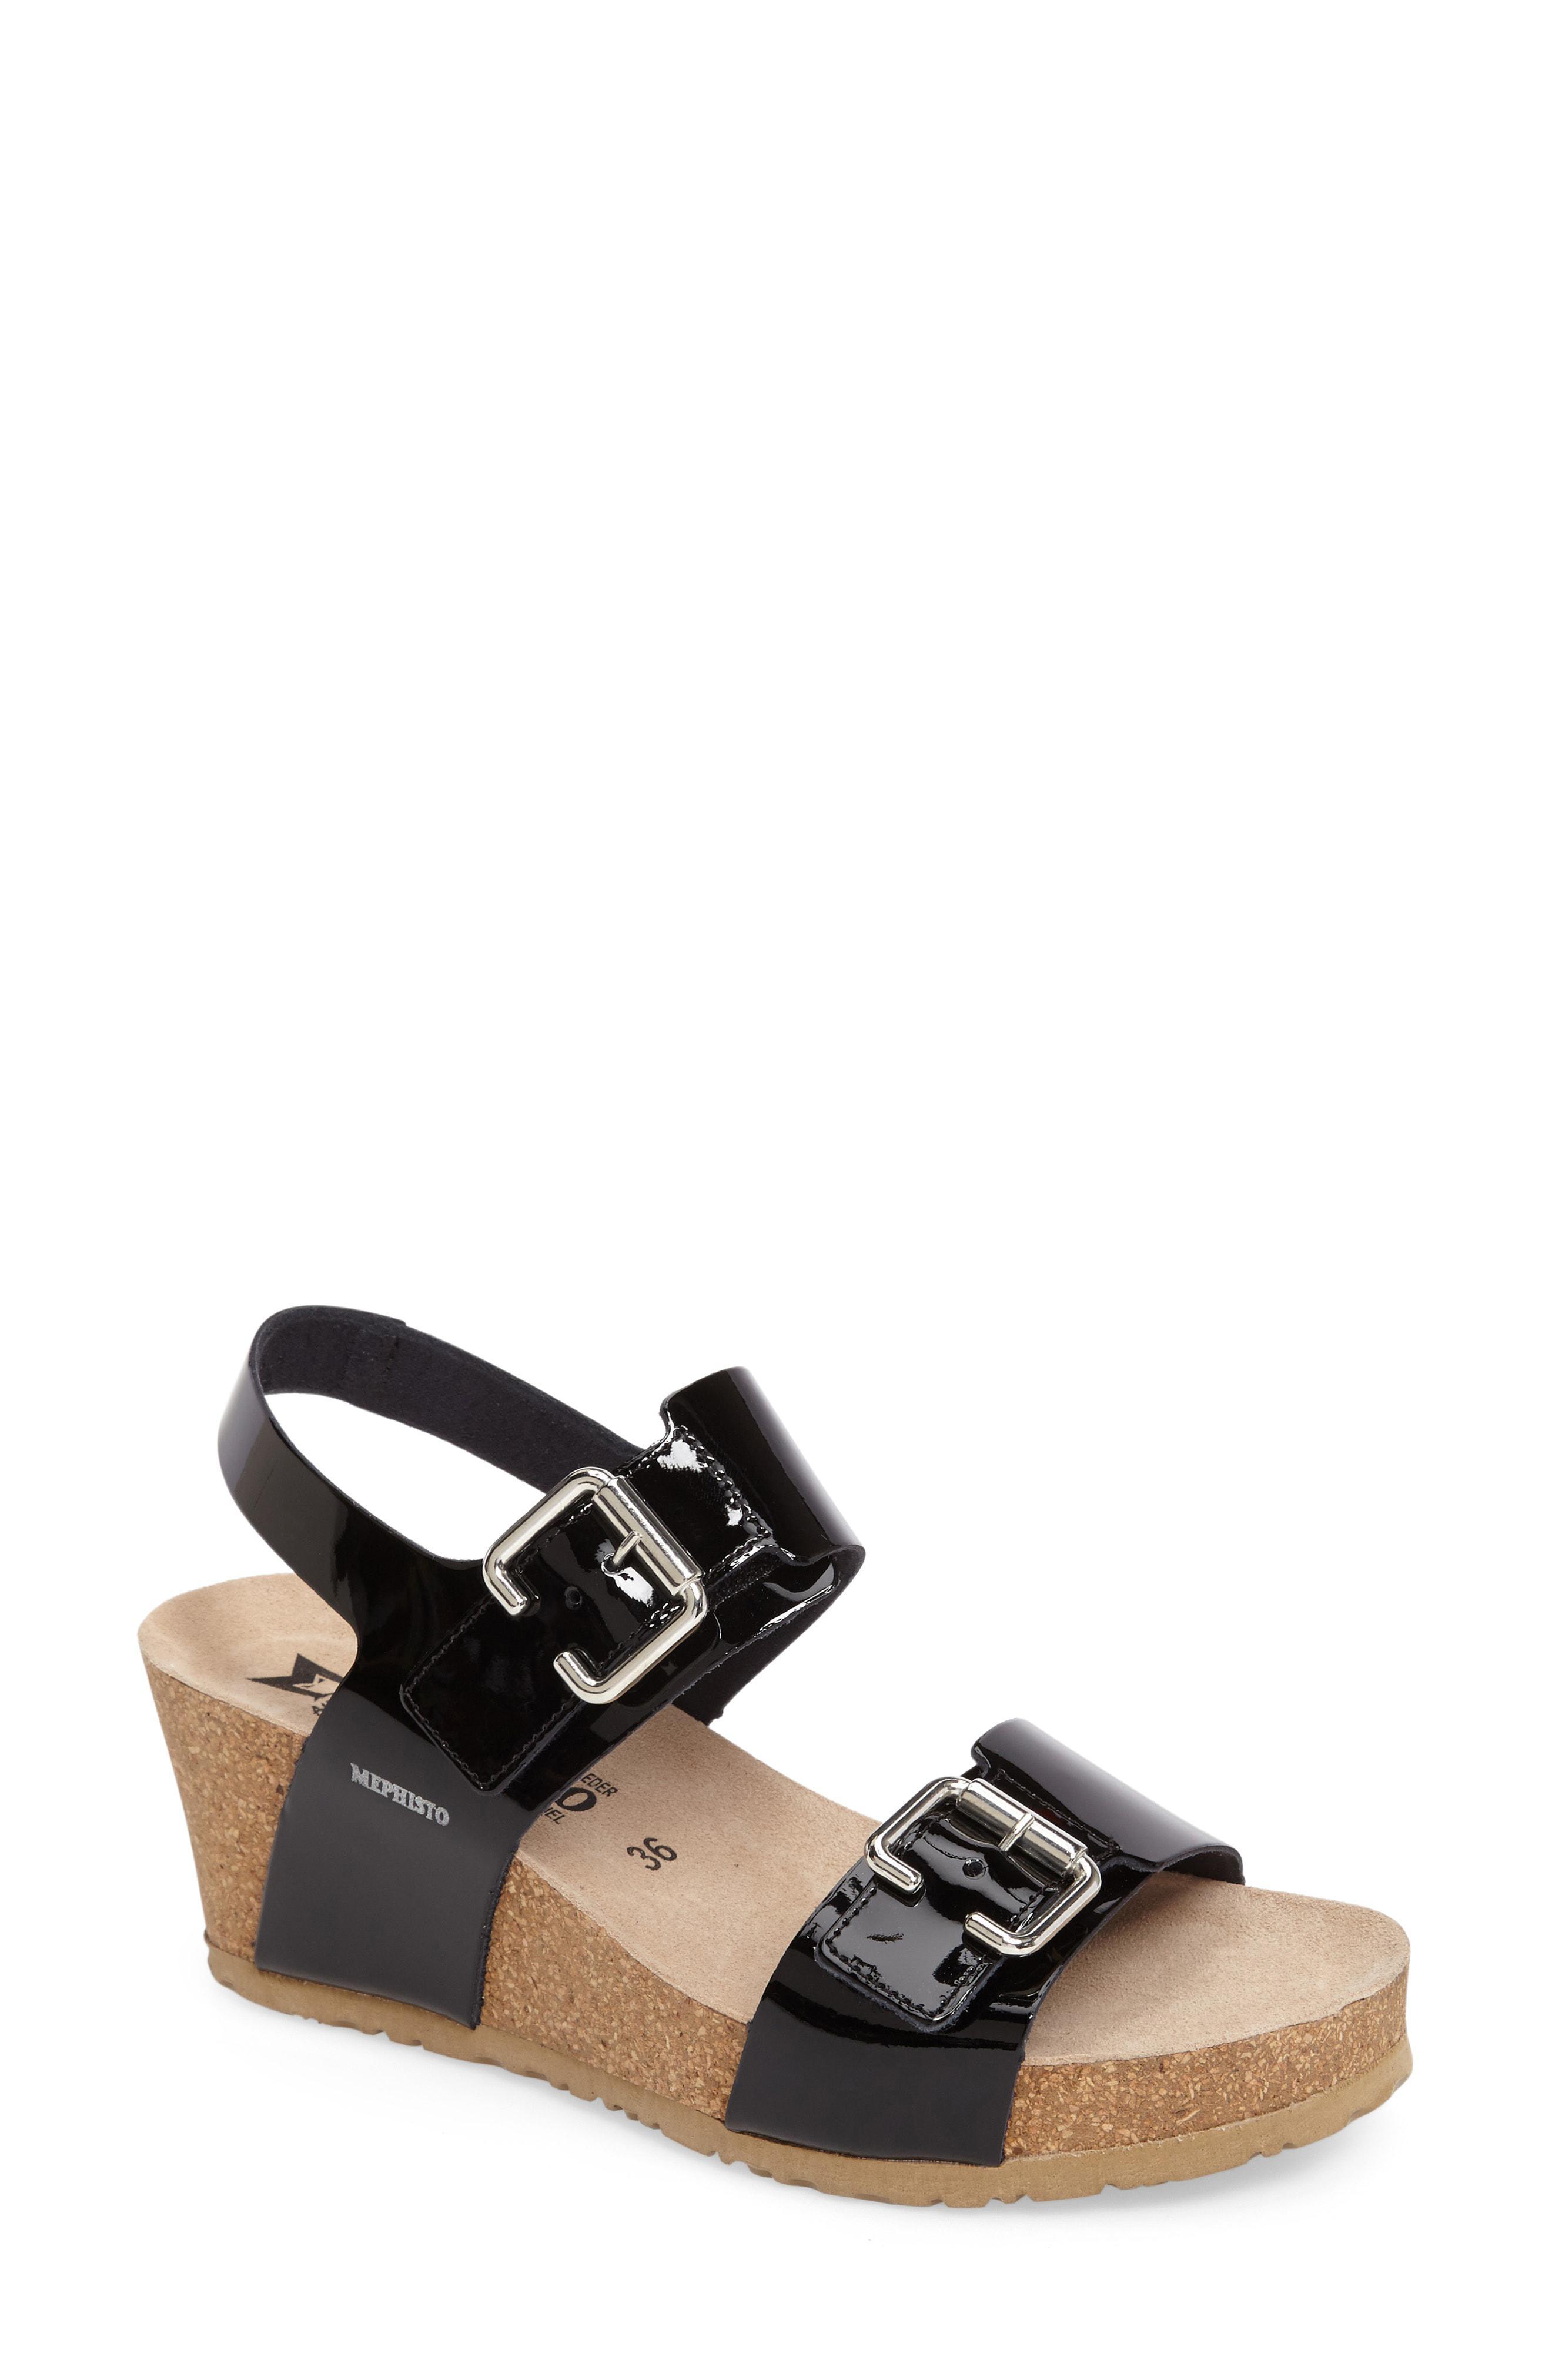 610b46a7656 Lyst - Mephisto Lissandra Platform Wedge Sandal in Black